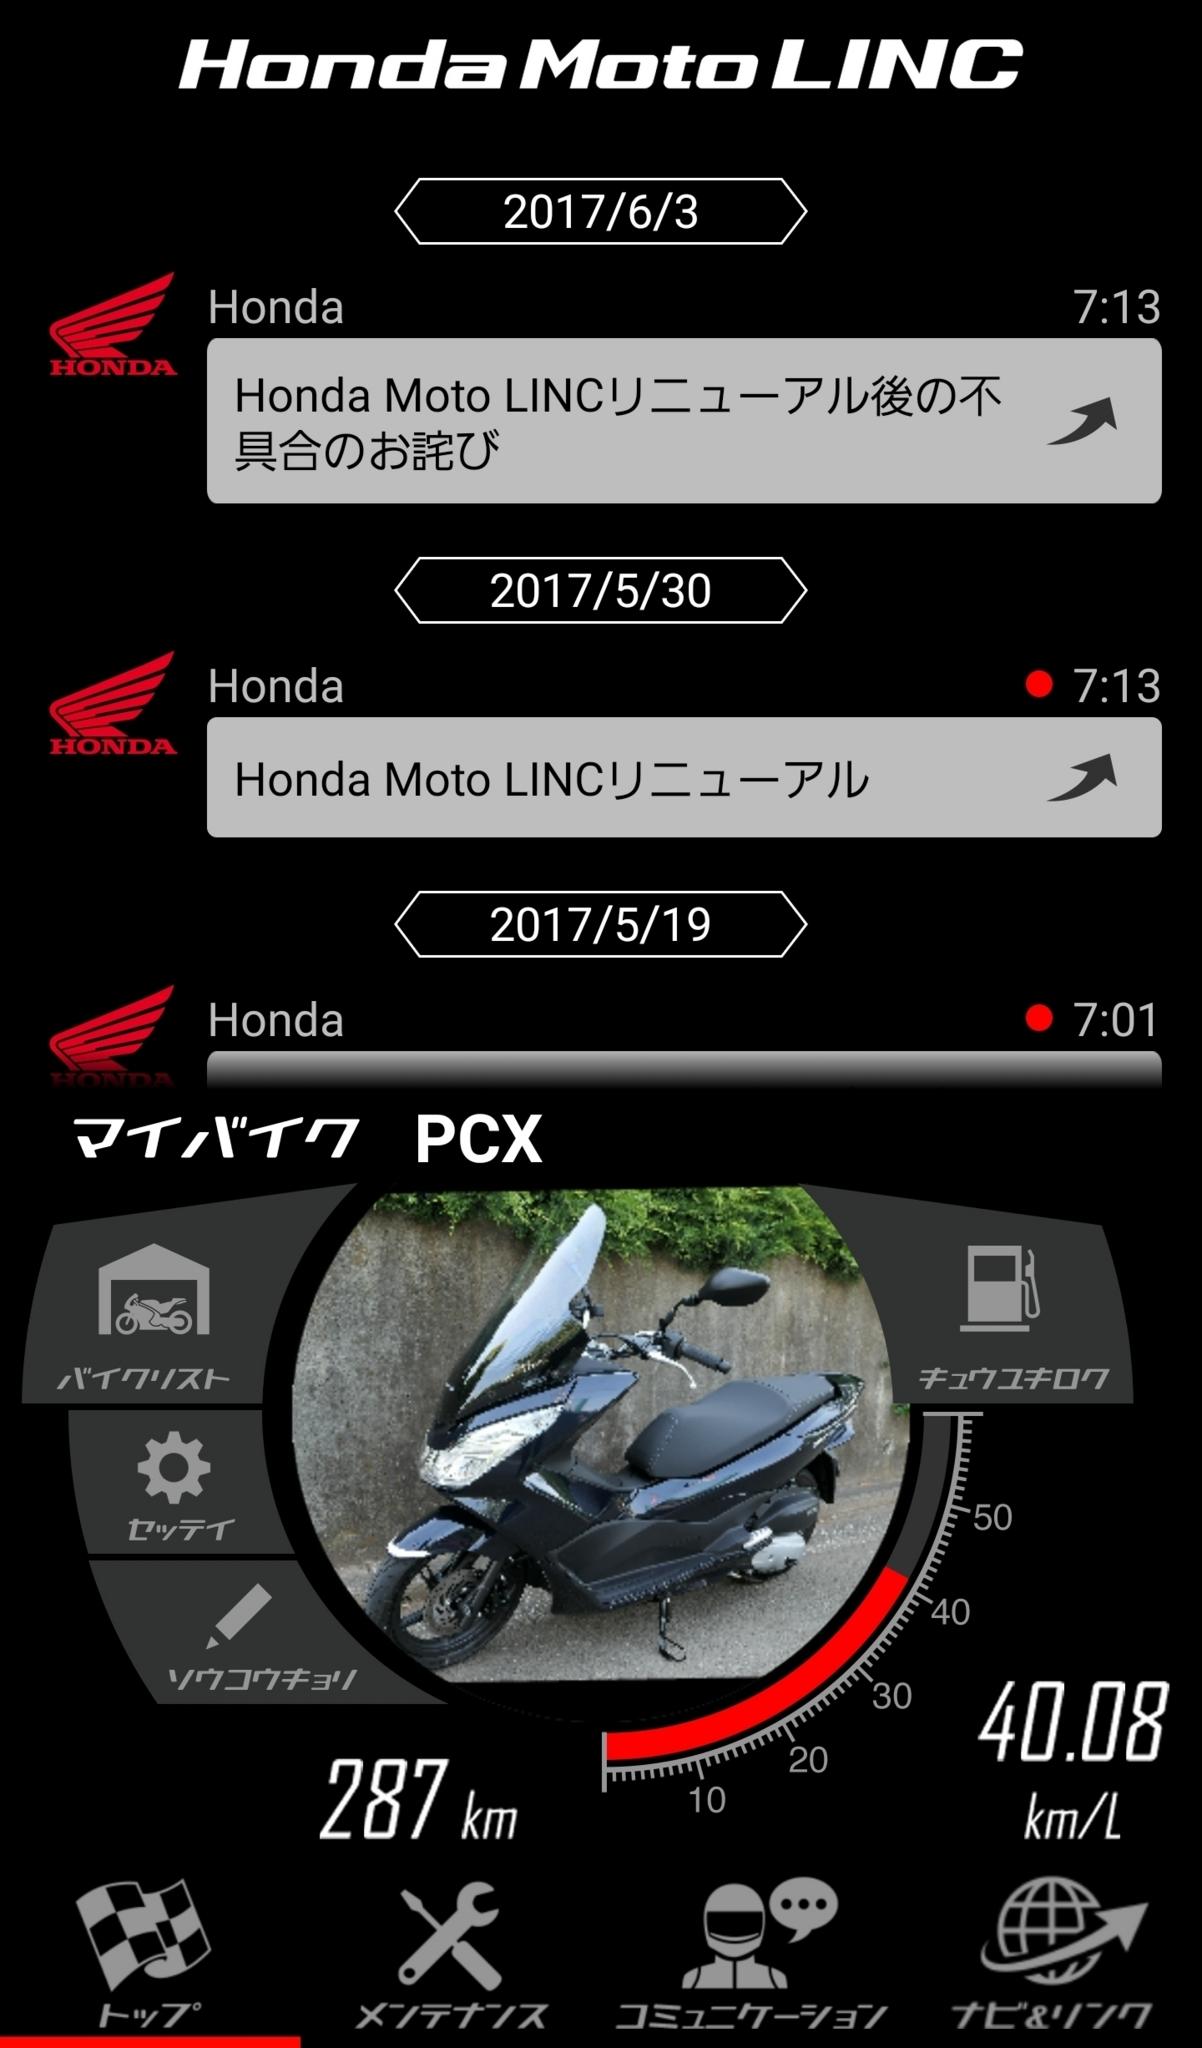 f:id:ToshUeno:20170624190832j:plain